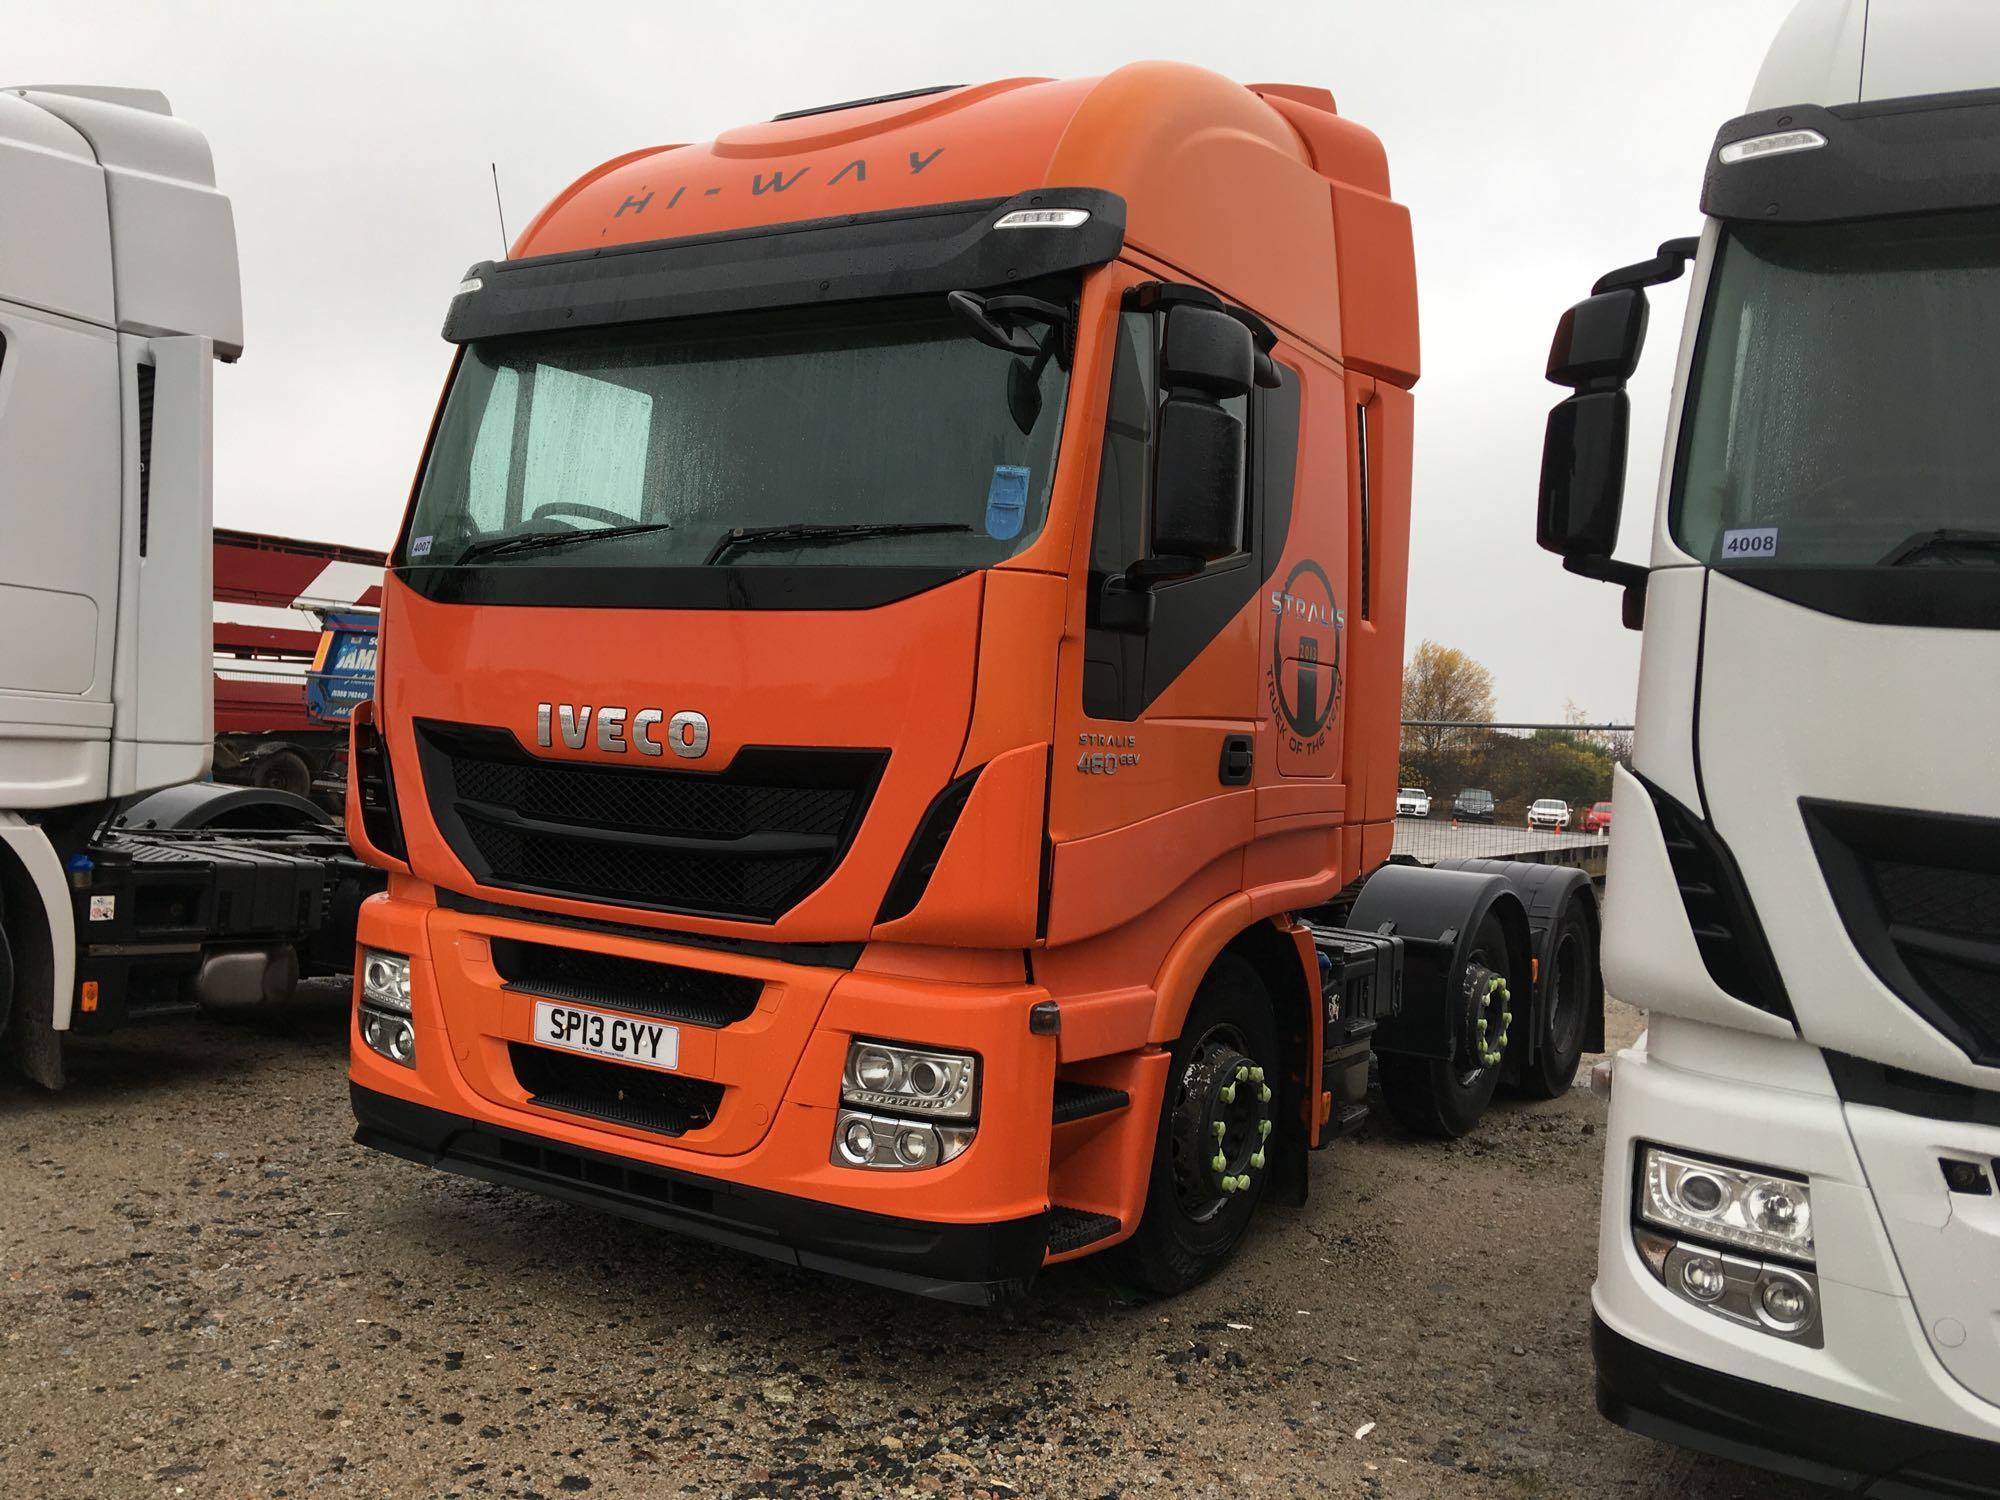 Lot 4007 - Iveco Stralis As440s46tx/p S-a - 10308cc 2 Door Truck